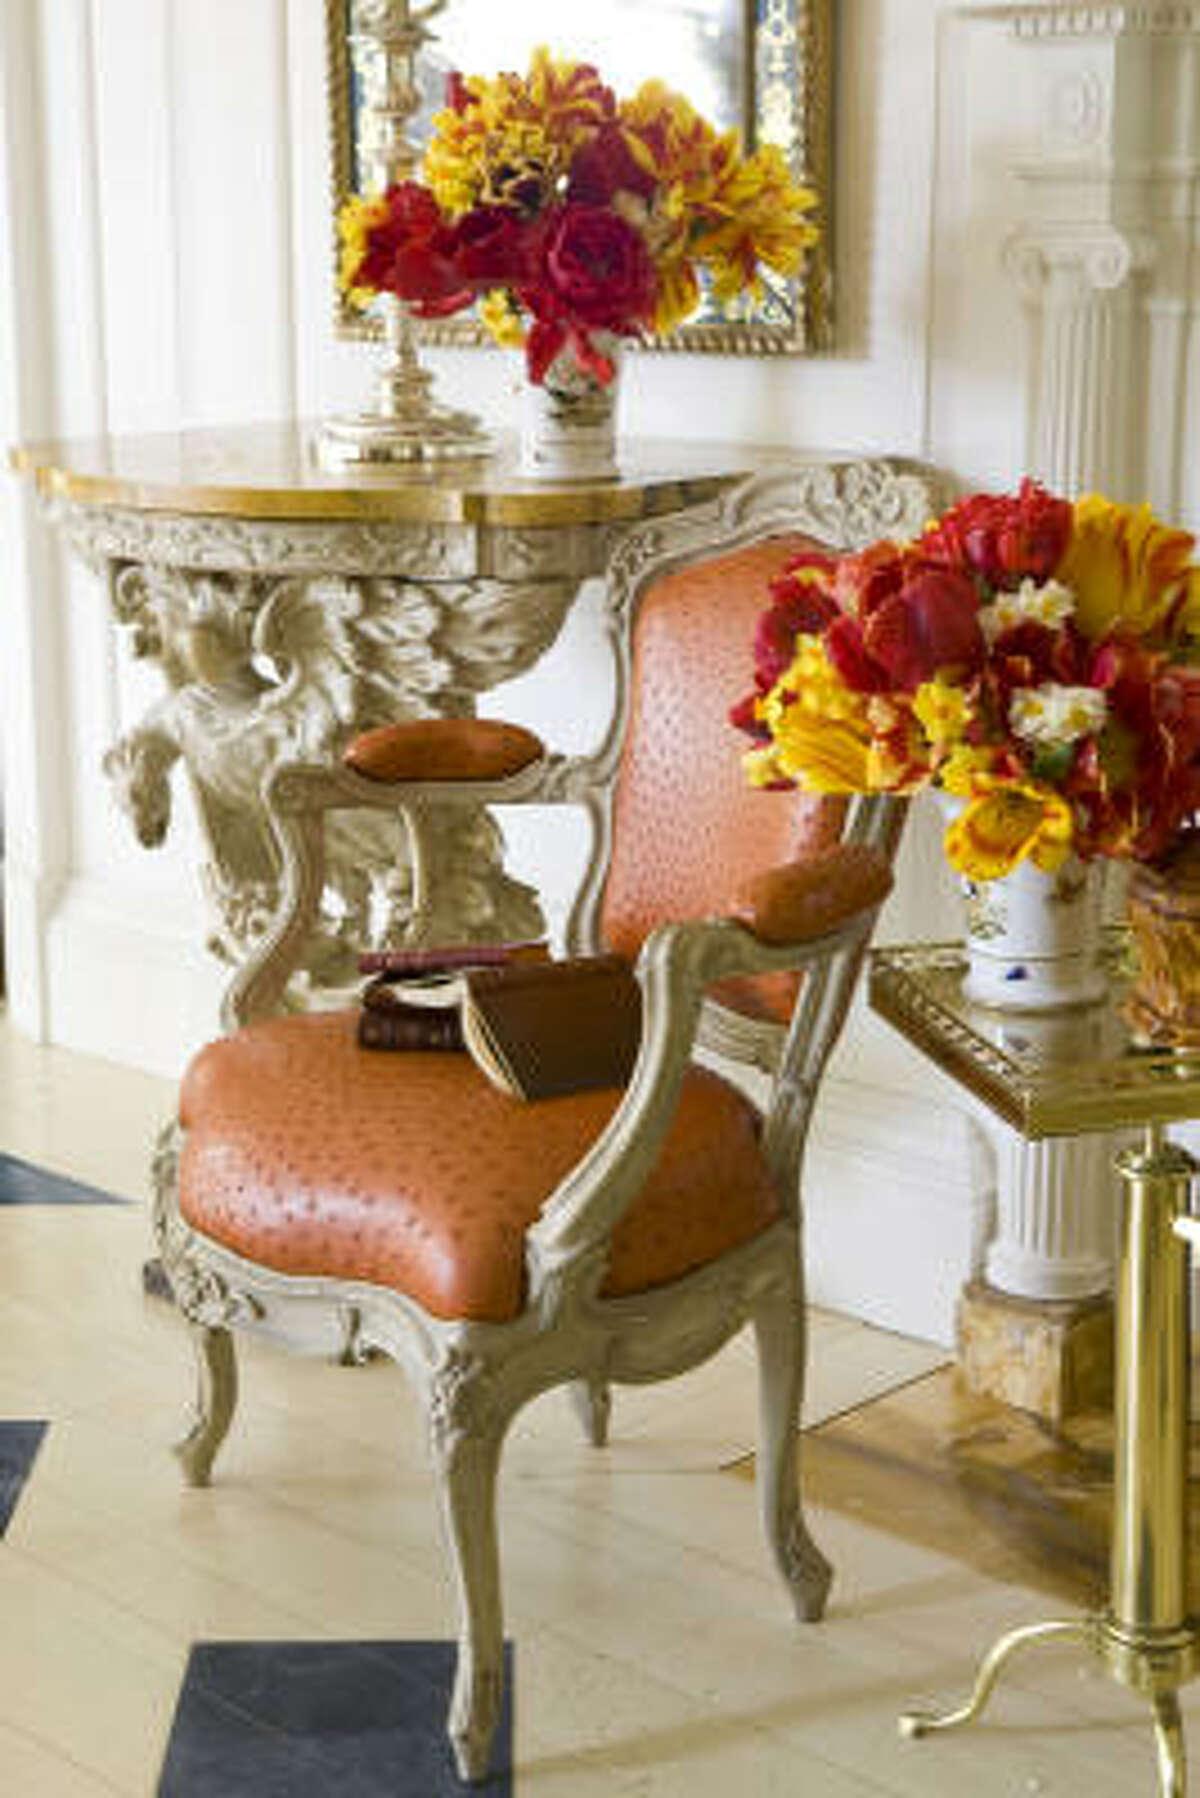 Designer Carolyne Roehm's room use elegant details, flowers and sophisticated furnishings.